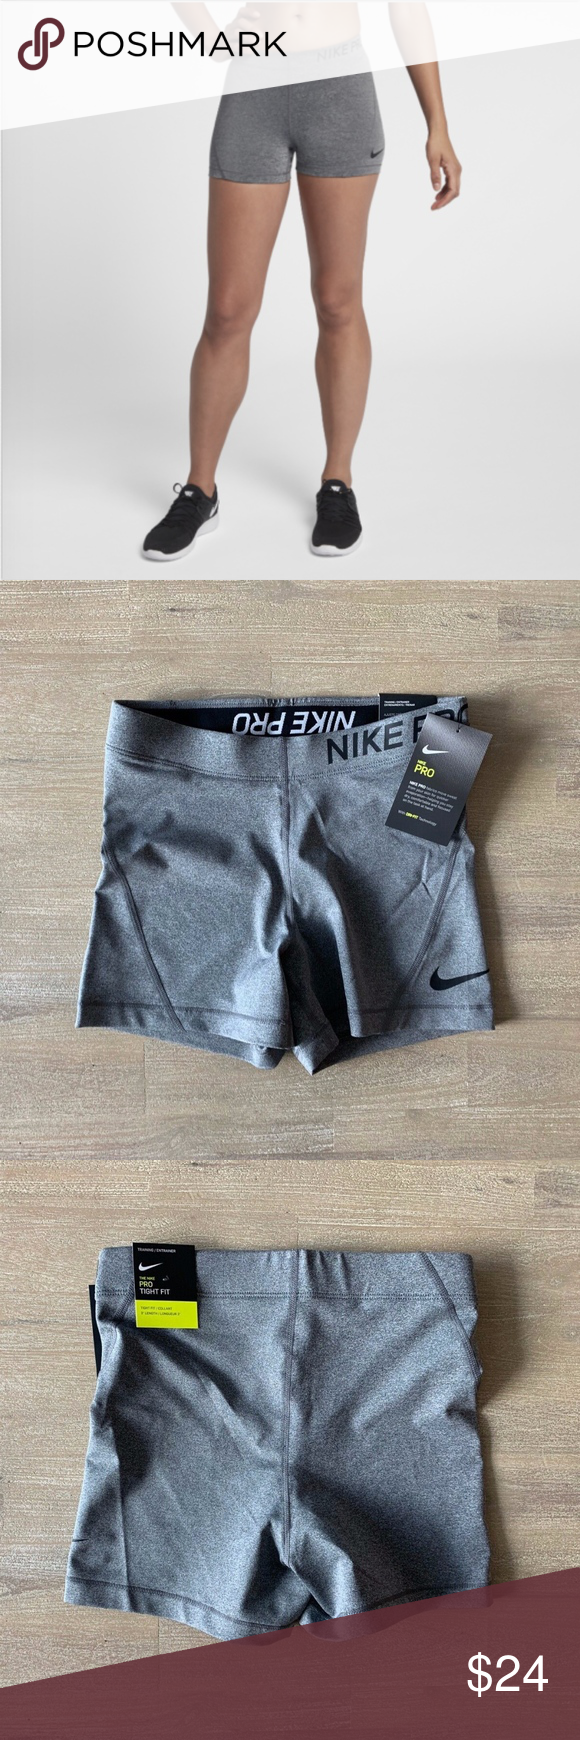 "Casarse sangrado Interrupción  NIKE PRO DRI FIT 3"" TRAINING SPANDEX SHORTS | NWT | Spandex shorts, Nike  pros, Dri fit"